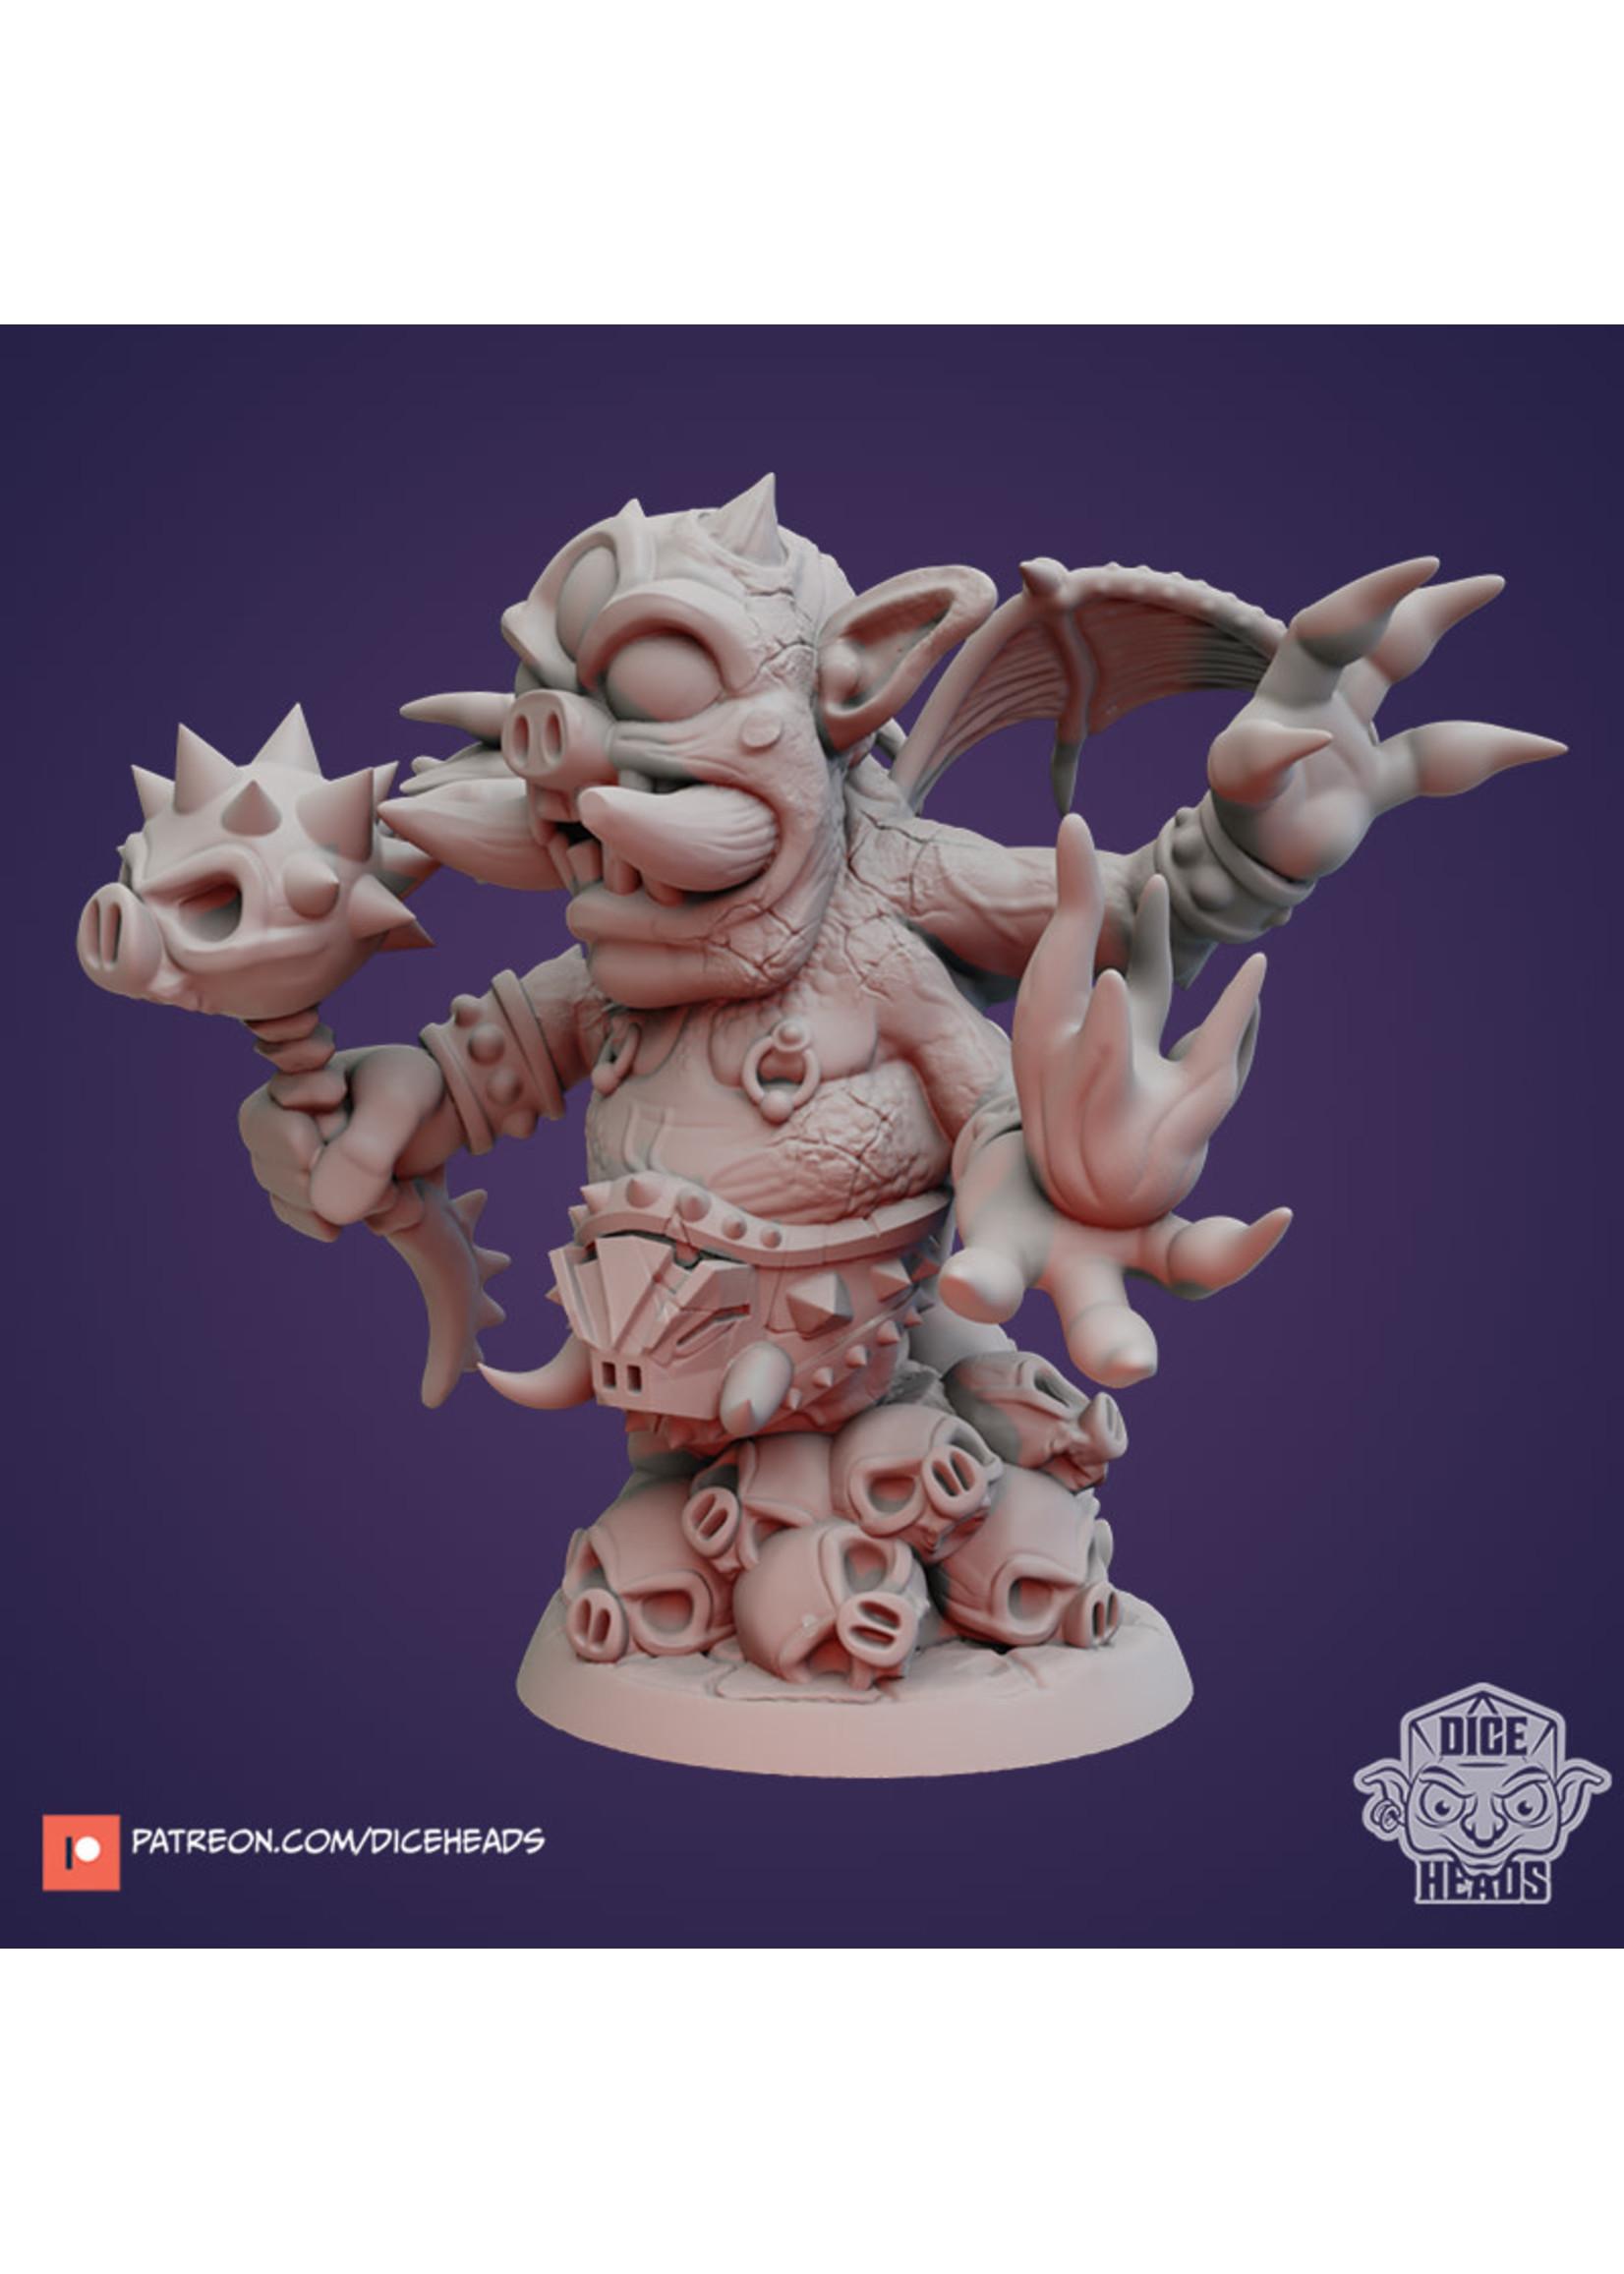 3D Printed Miniature - Porcus - Dungeons & Dragons - Zoontalis KS